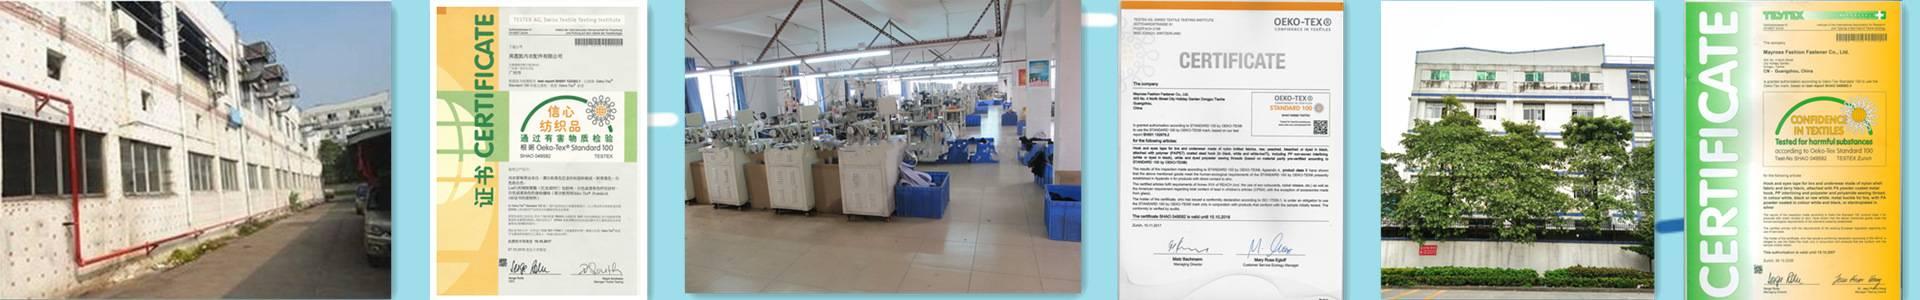 Best Plastic Hook And Eye And Playtex Bra Extenders Manufacture-Mayrose-img-1